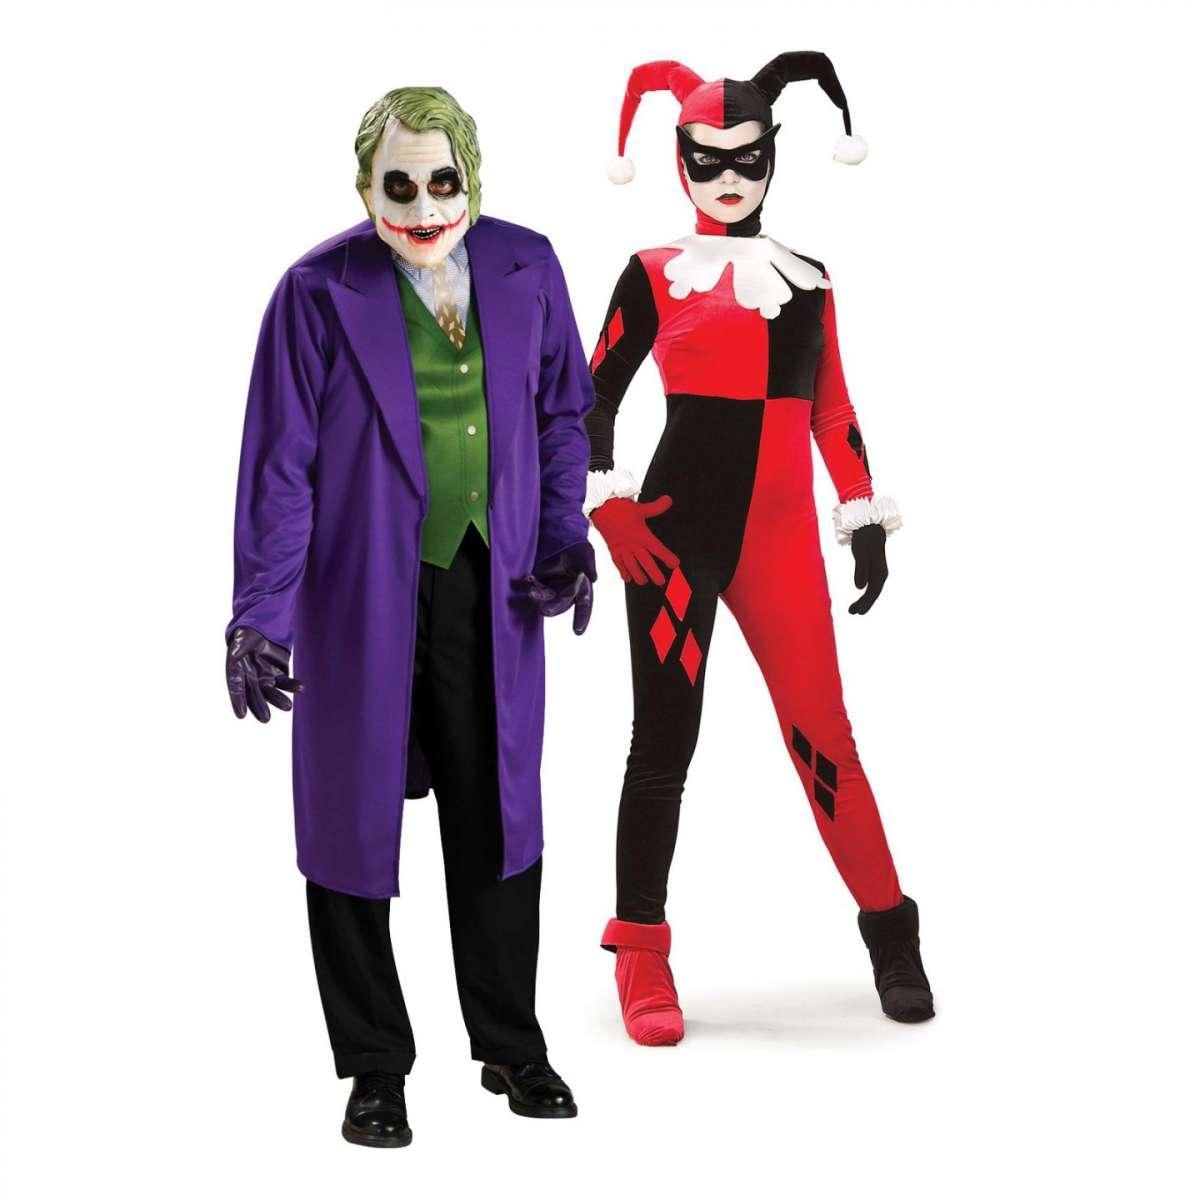 Costumi da Joker e arlecchino